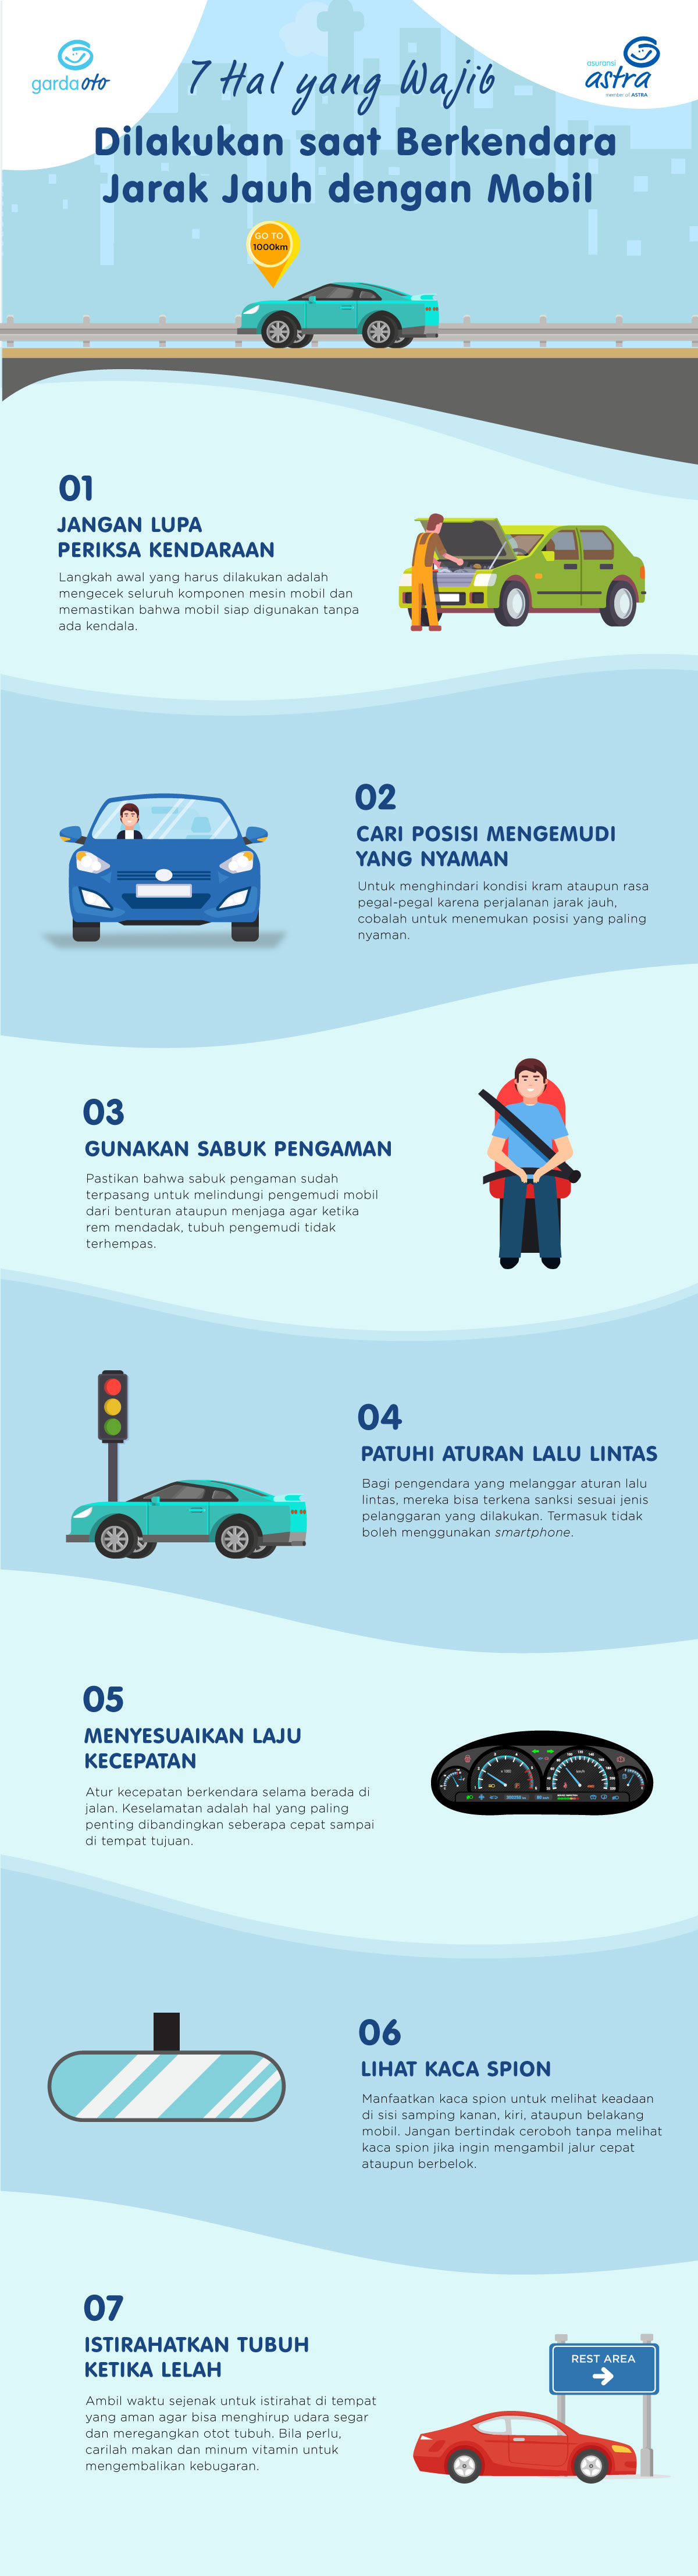 Infografis Tips Berkendara Jarak Jauh dengan Mobil pakai asuransi garda oto